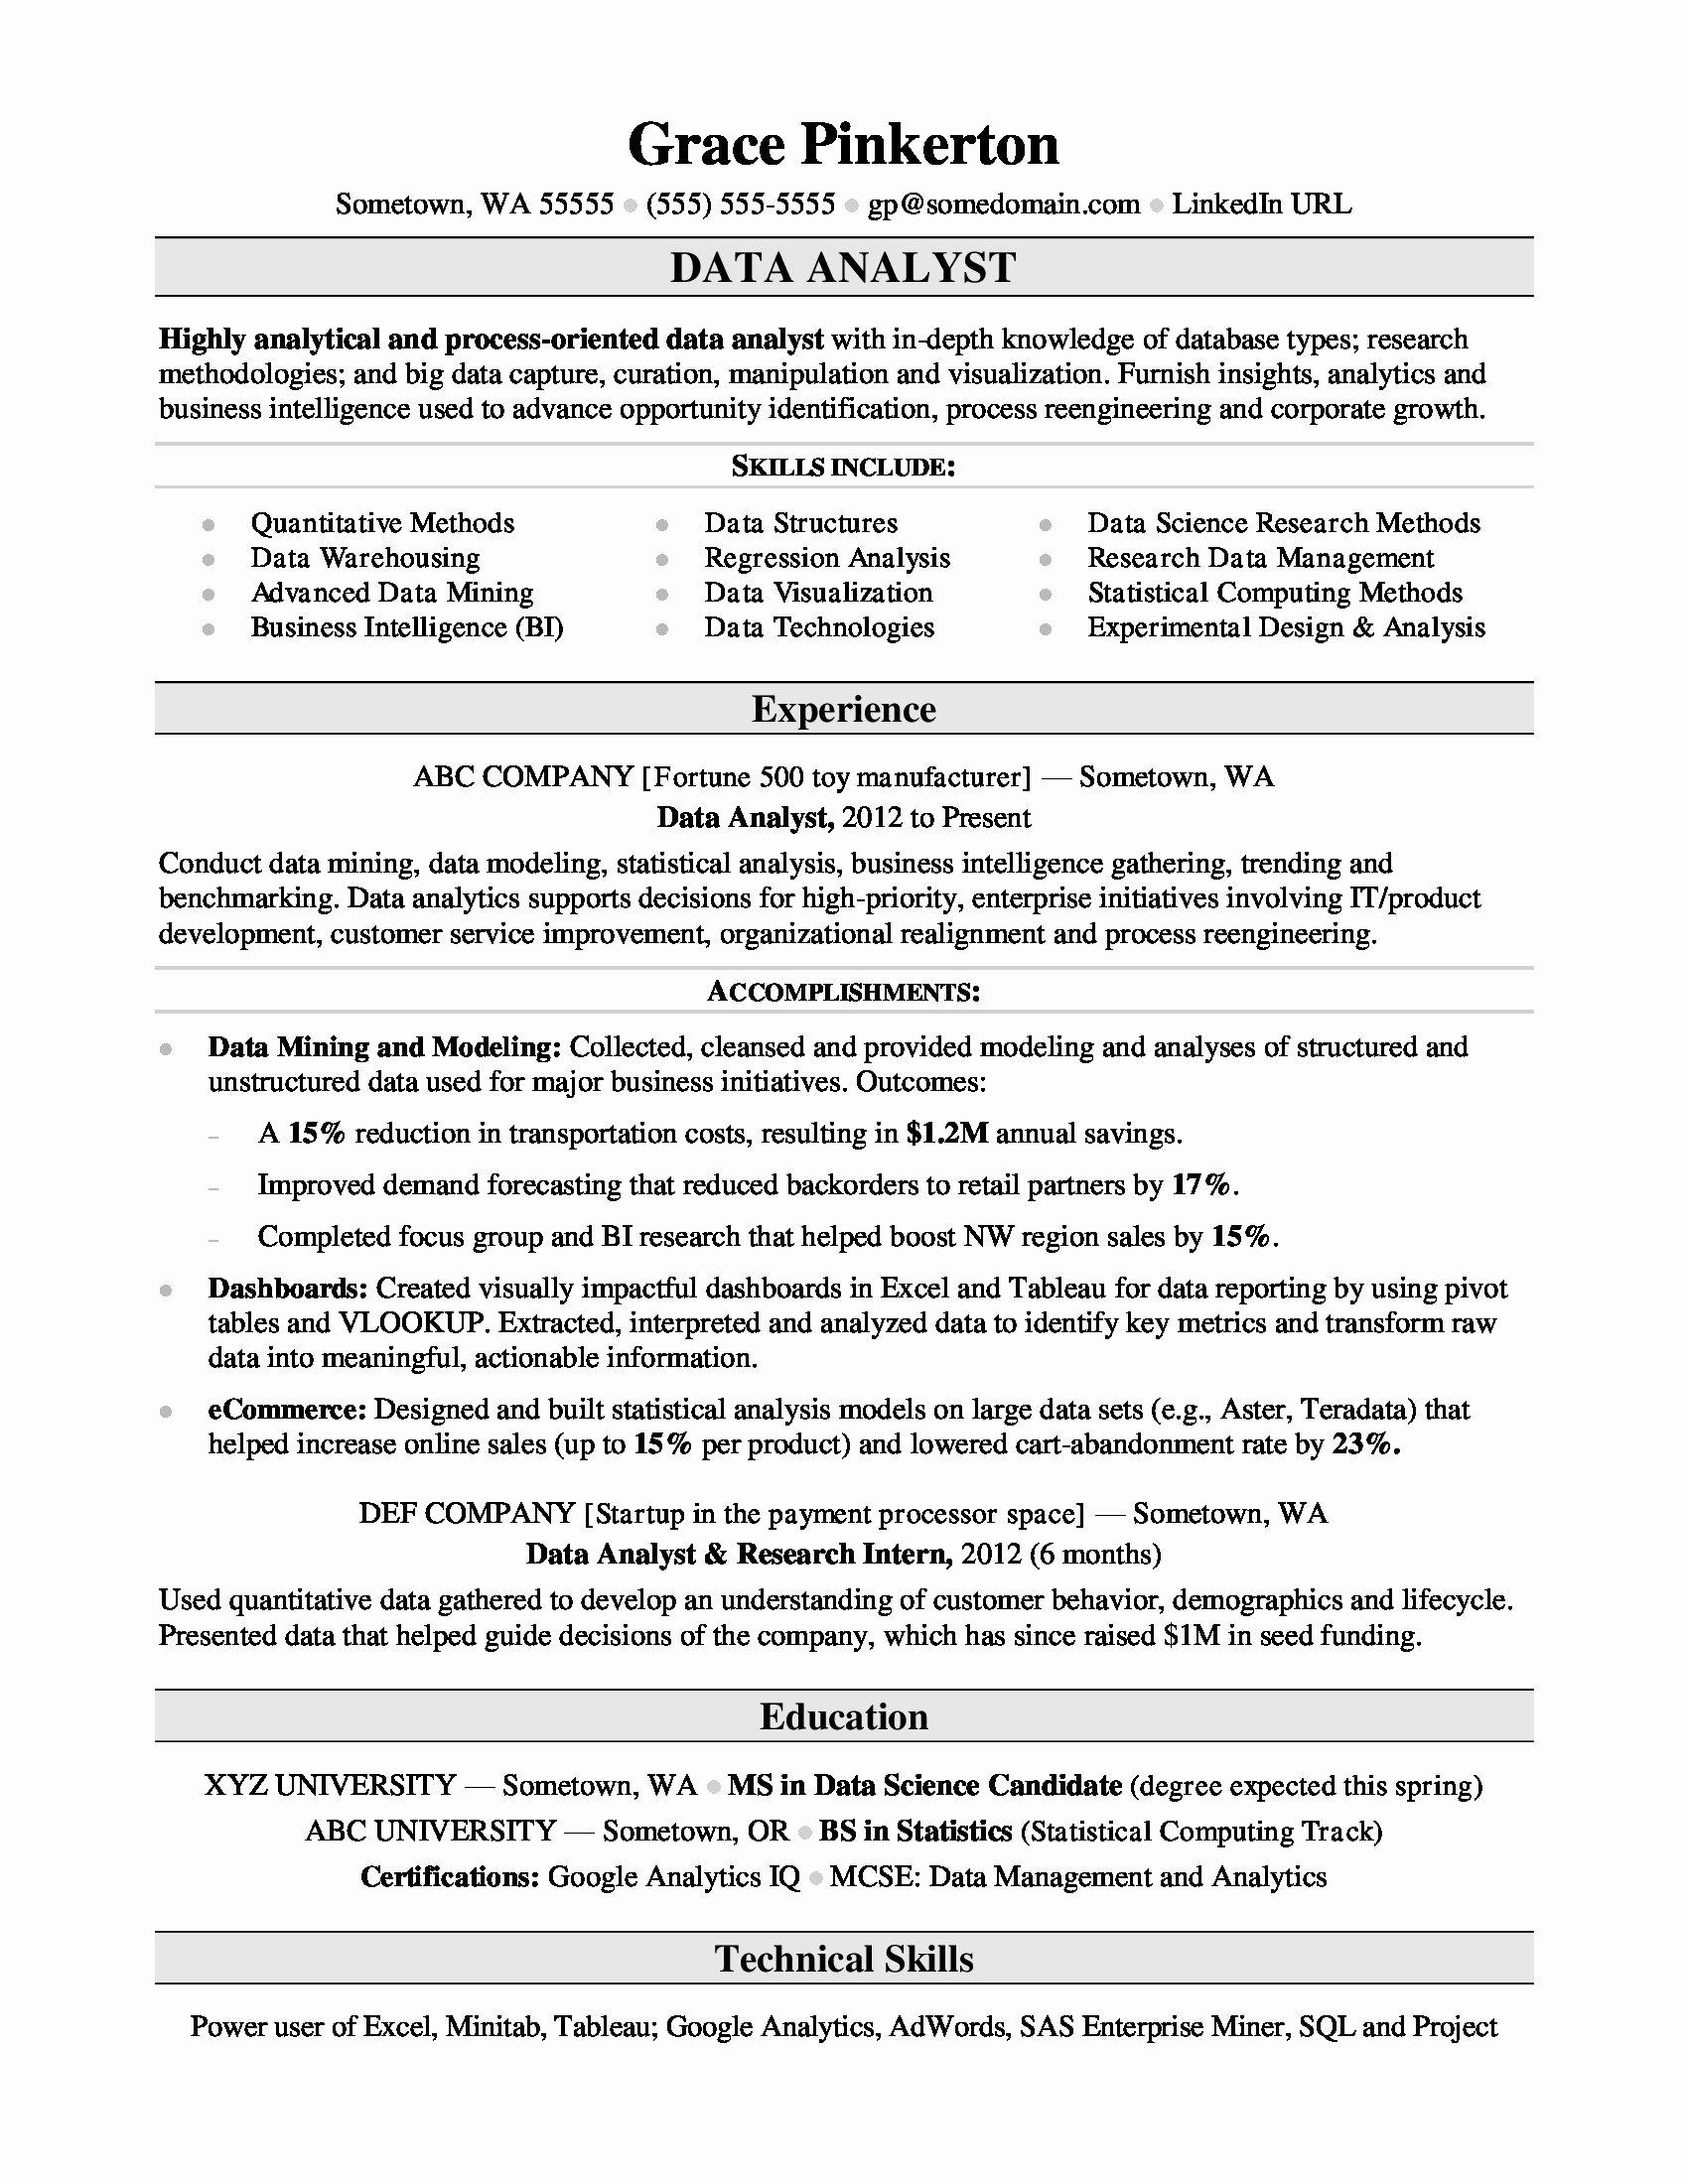 Data Analyst Resume Entry Level Best Of Data Analyst Resume Sample